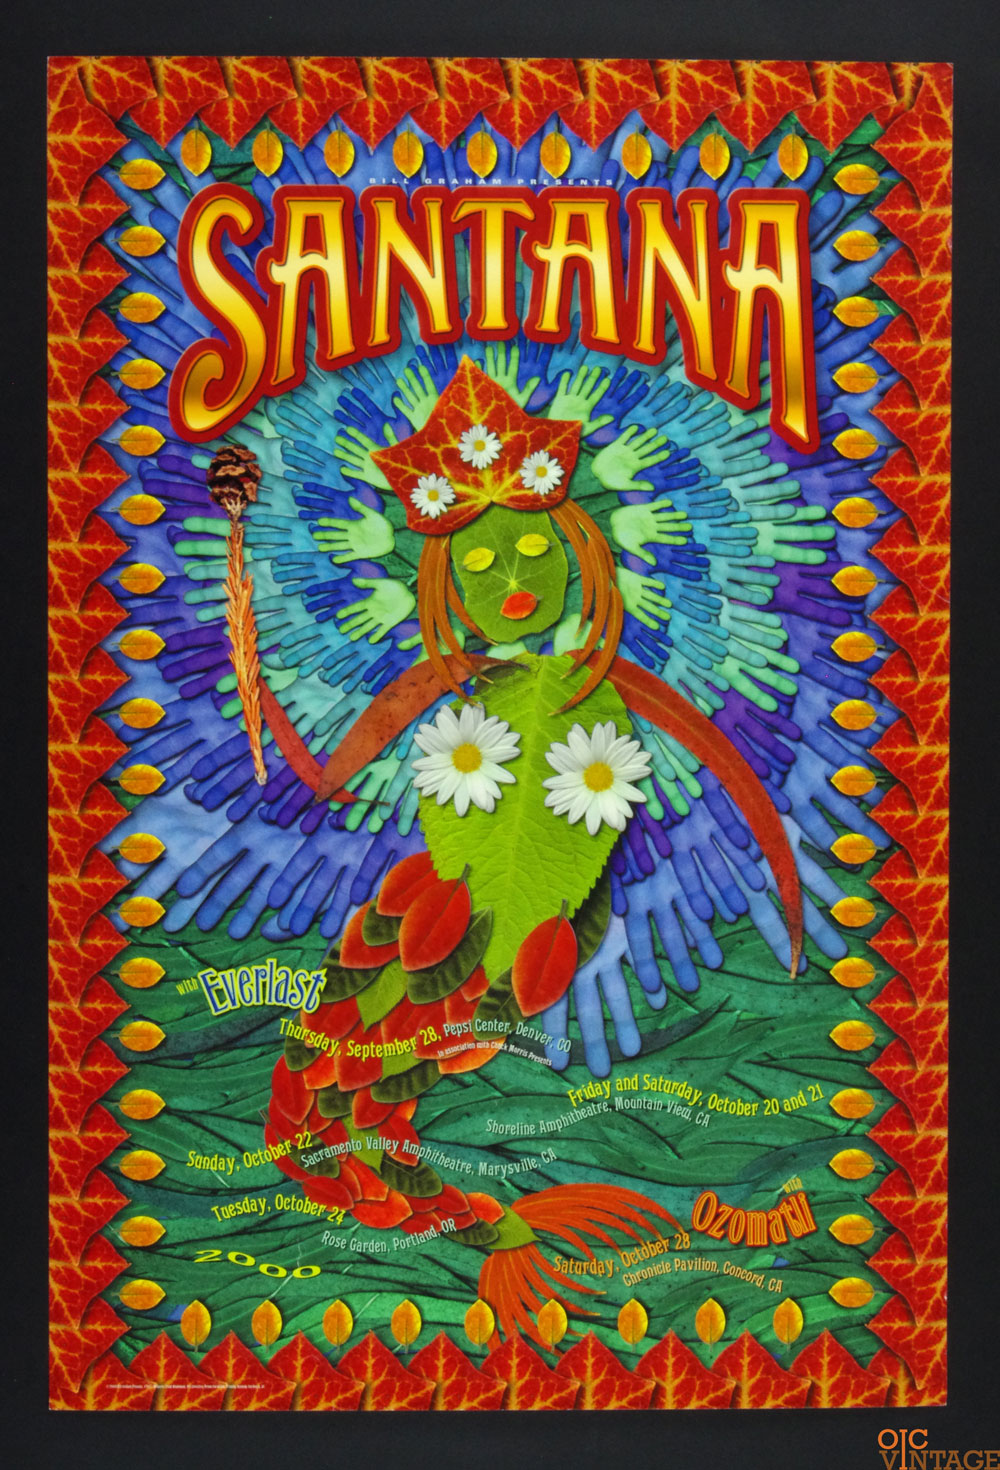 Bill Graham Presents Poster 2000 Sep 28 Santana Tour #247